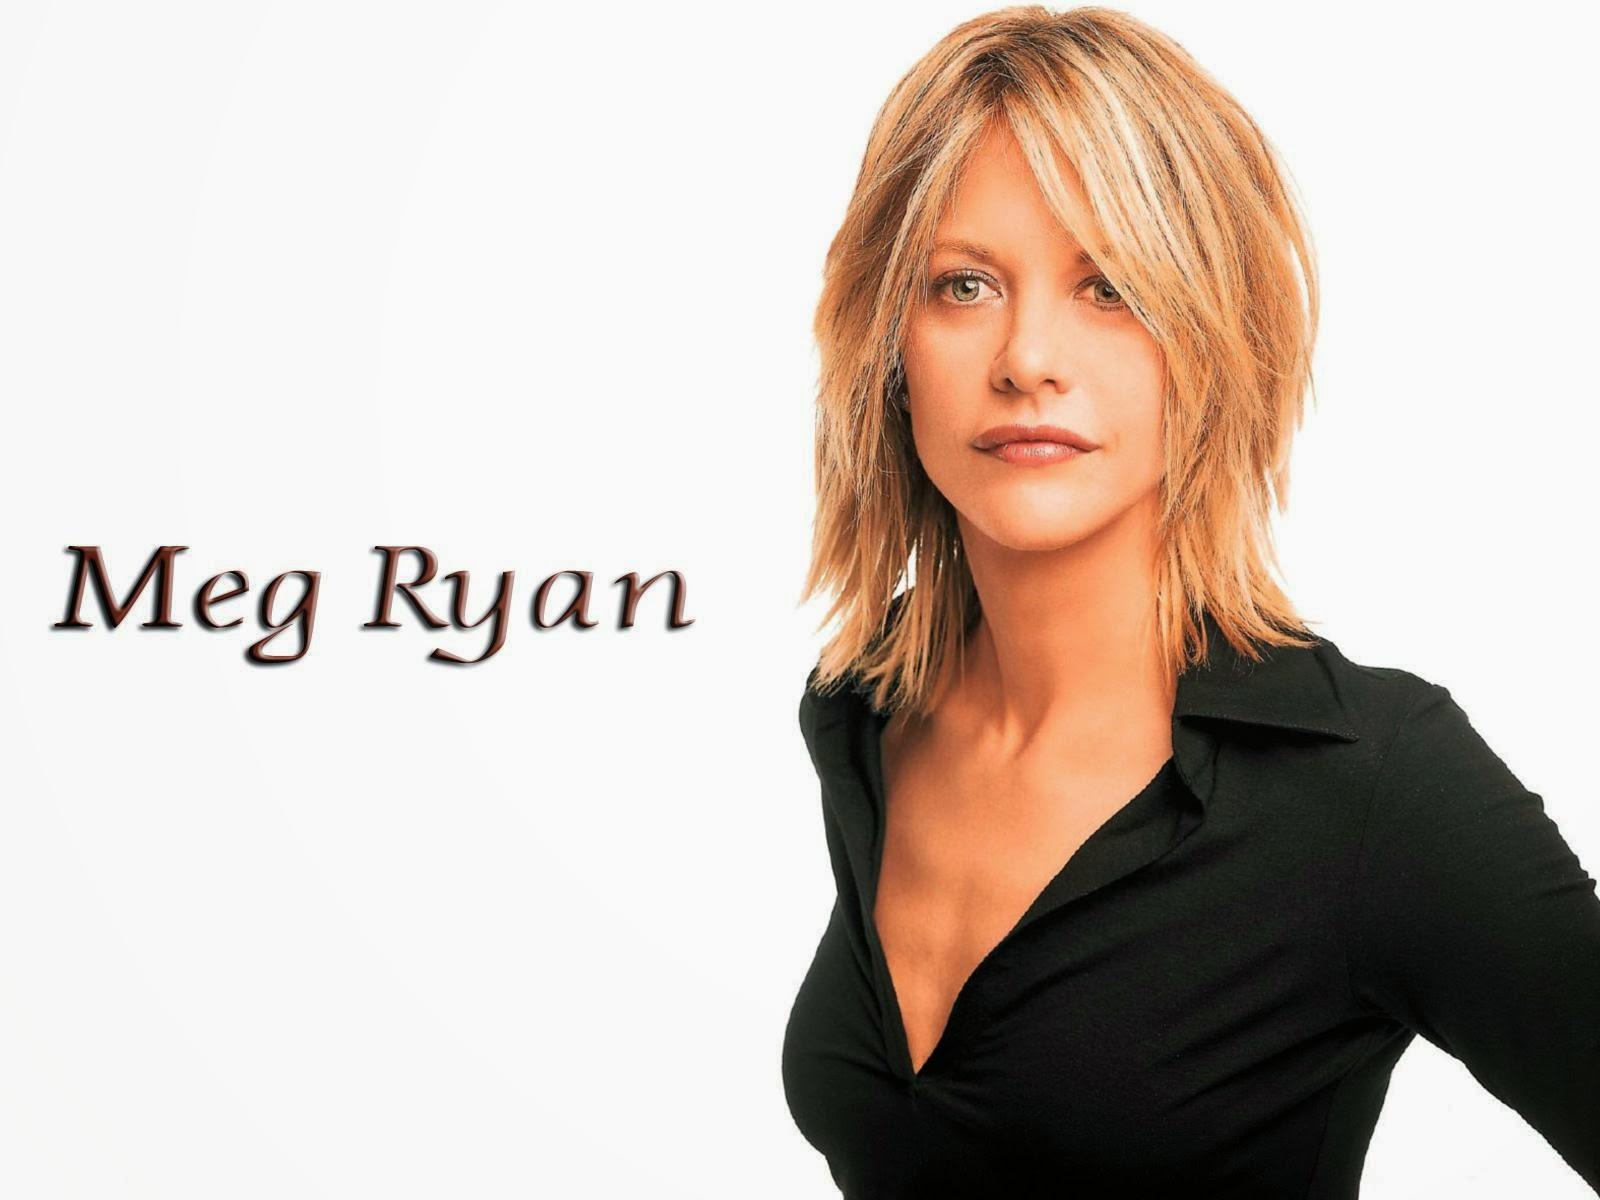 Meg Ryan Desktop wallpapers